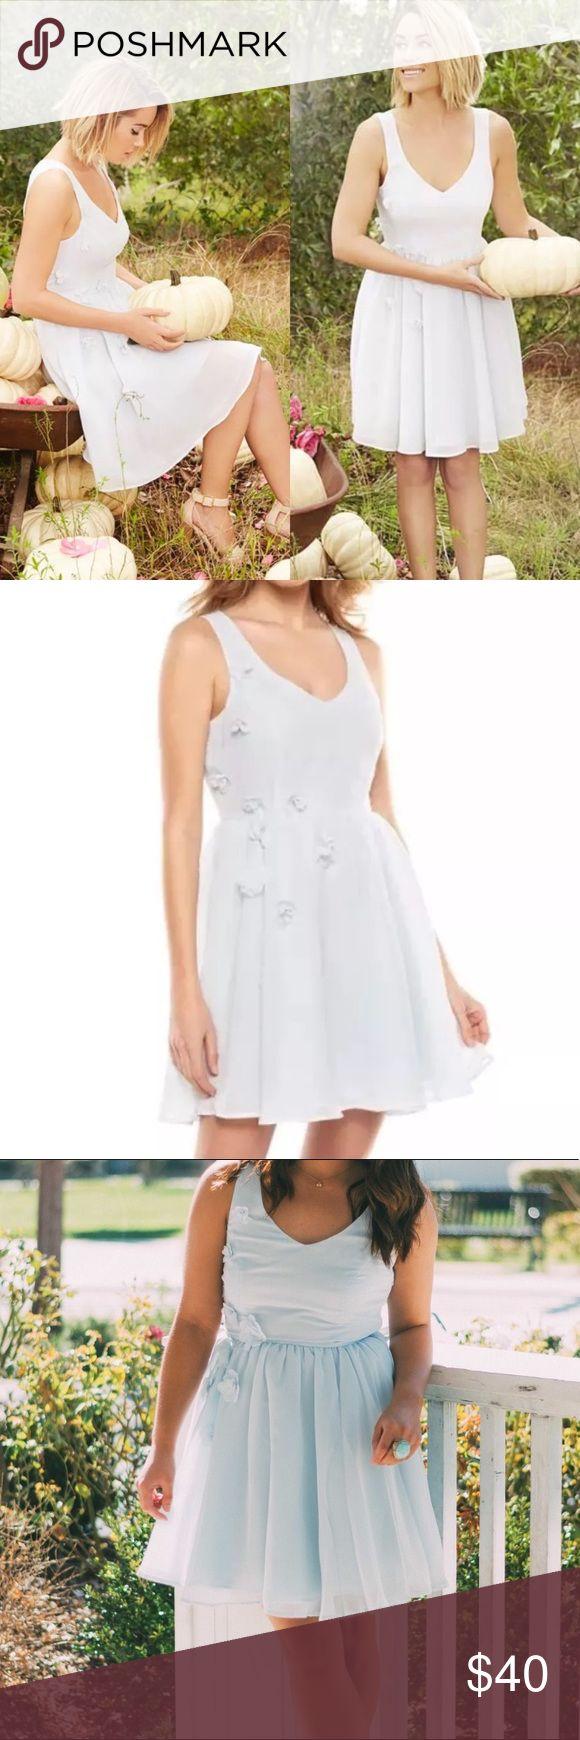 Limited edition Lauren Conrad Cinderella Dress Limited edition Cinderella dress from the Lauren Conrad collection LC Lauren Conrad Dresses Mini